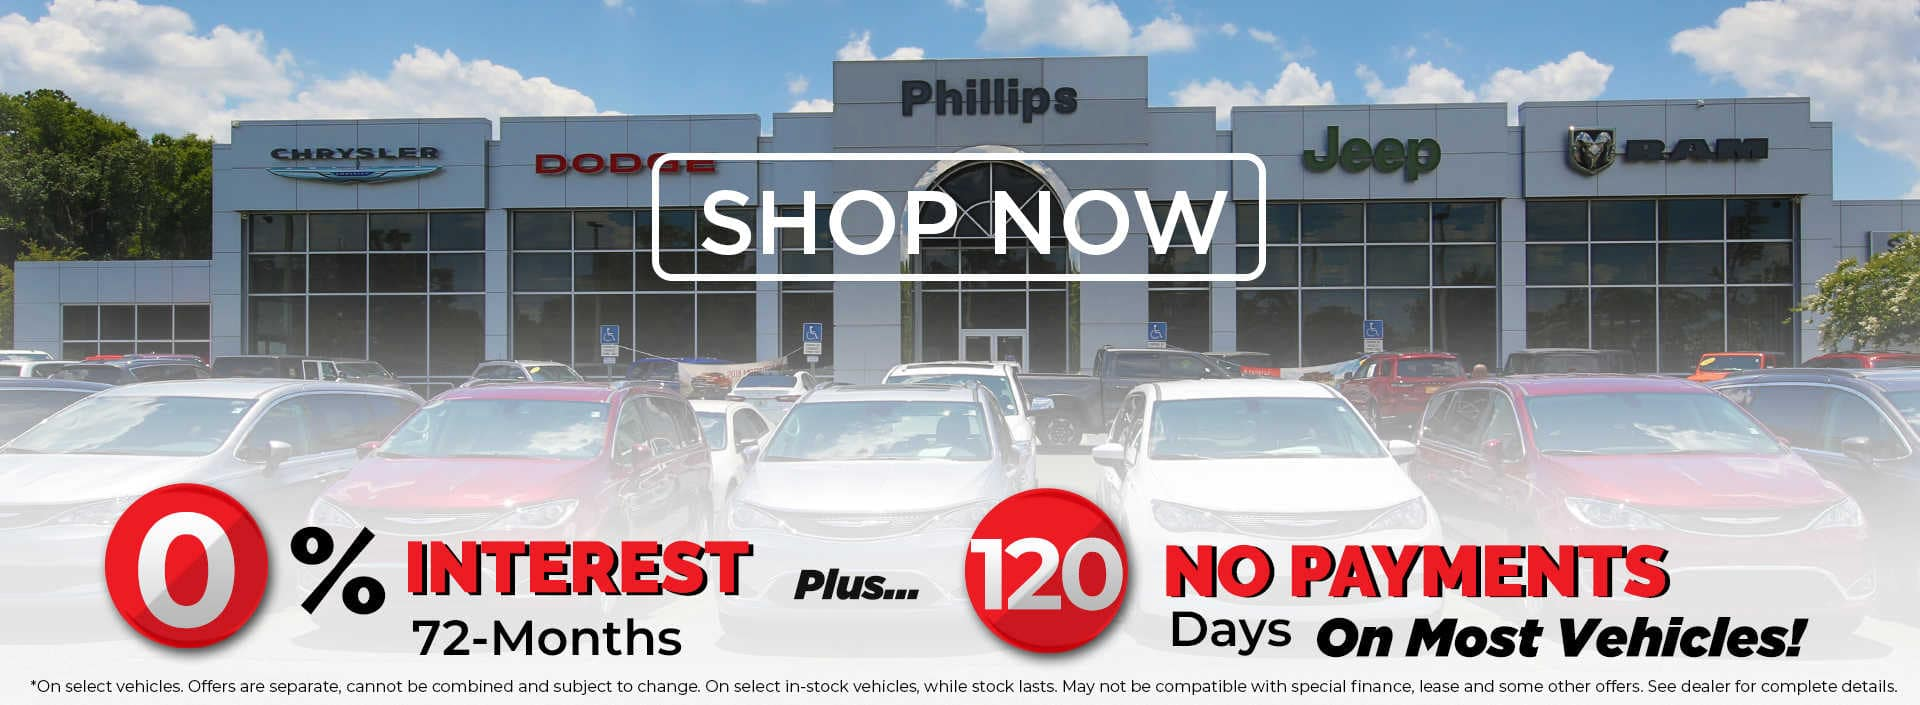 0 percent 72 months 120 days no payments